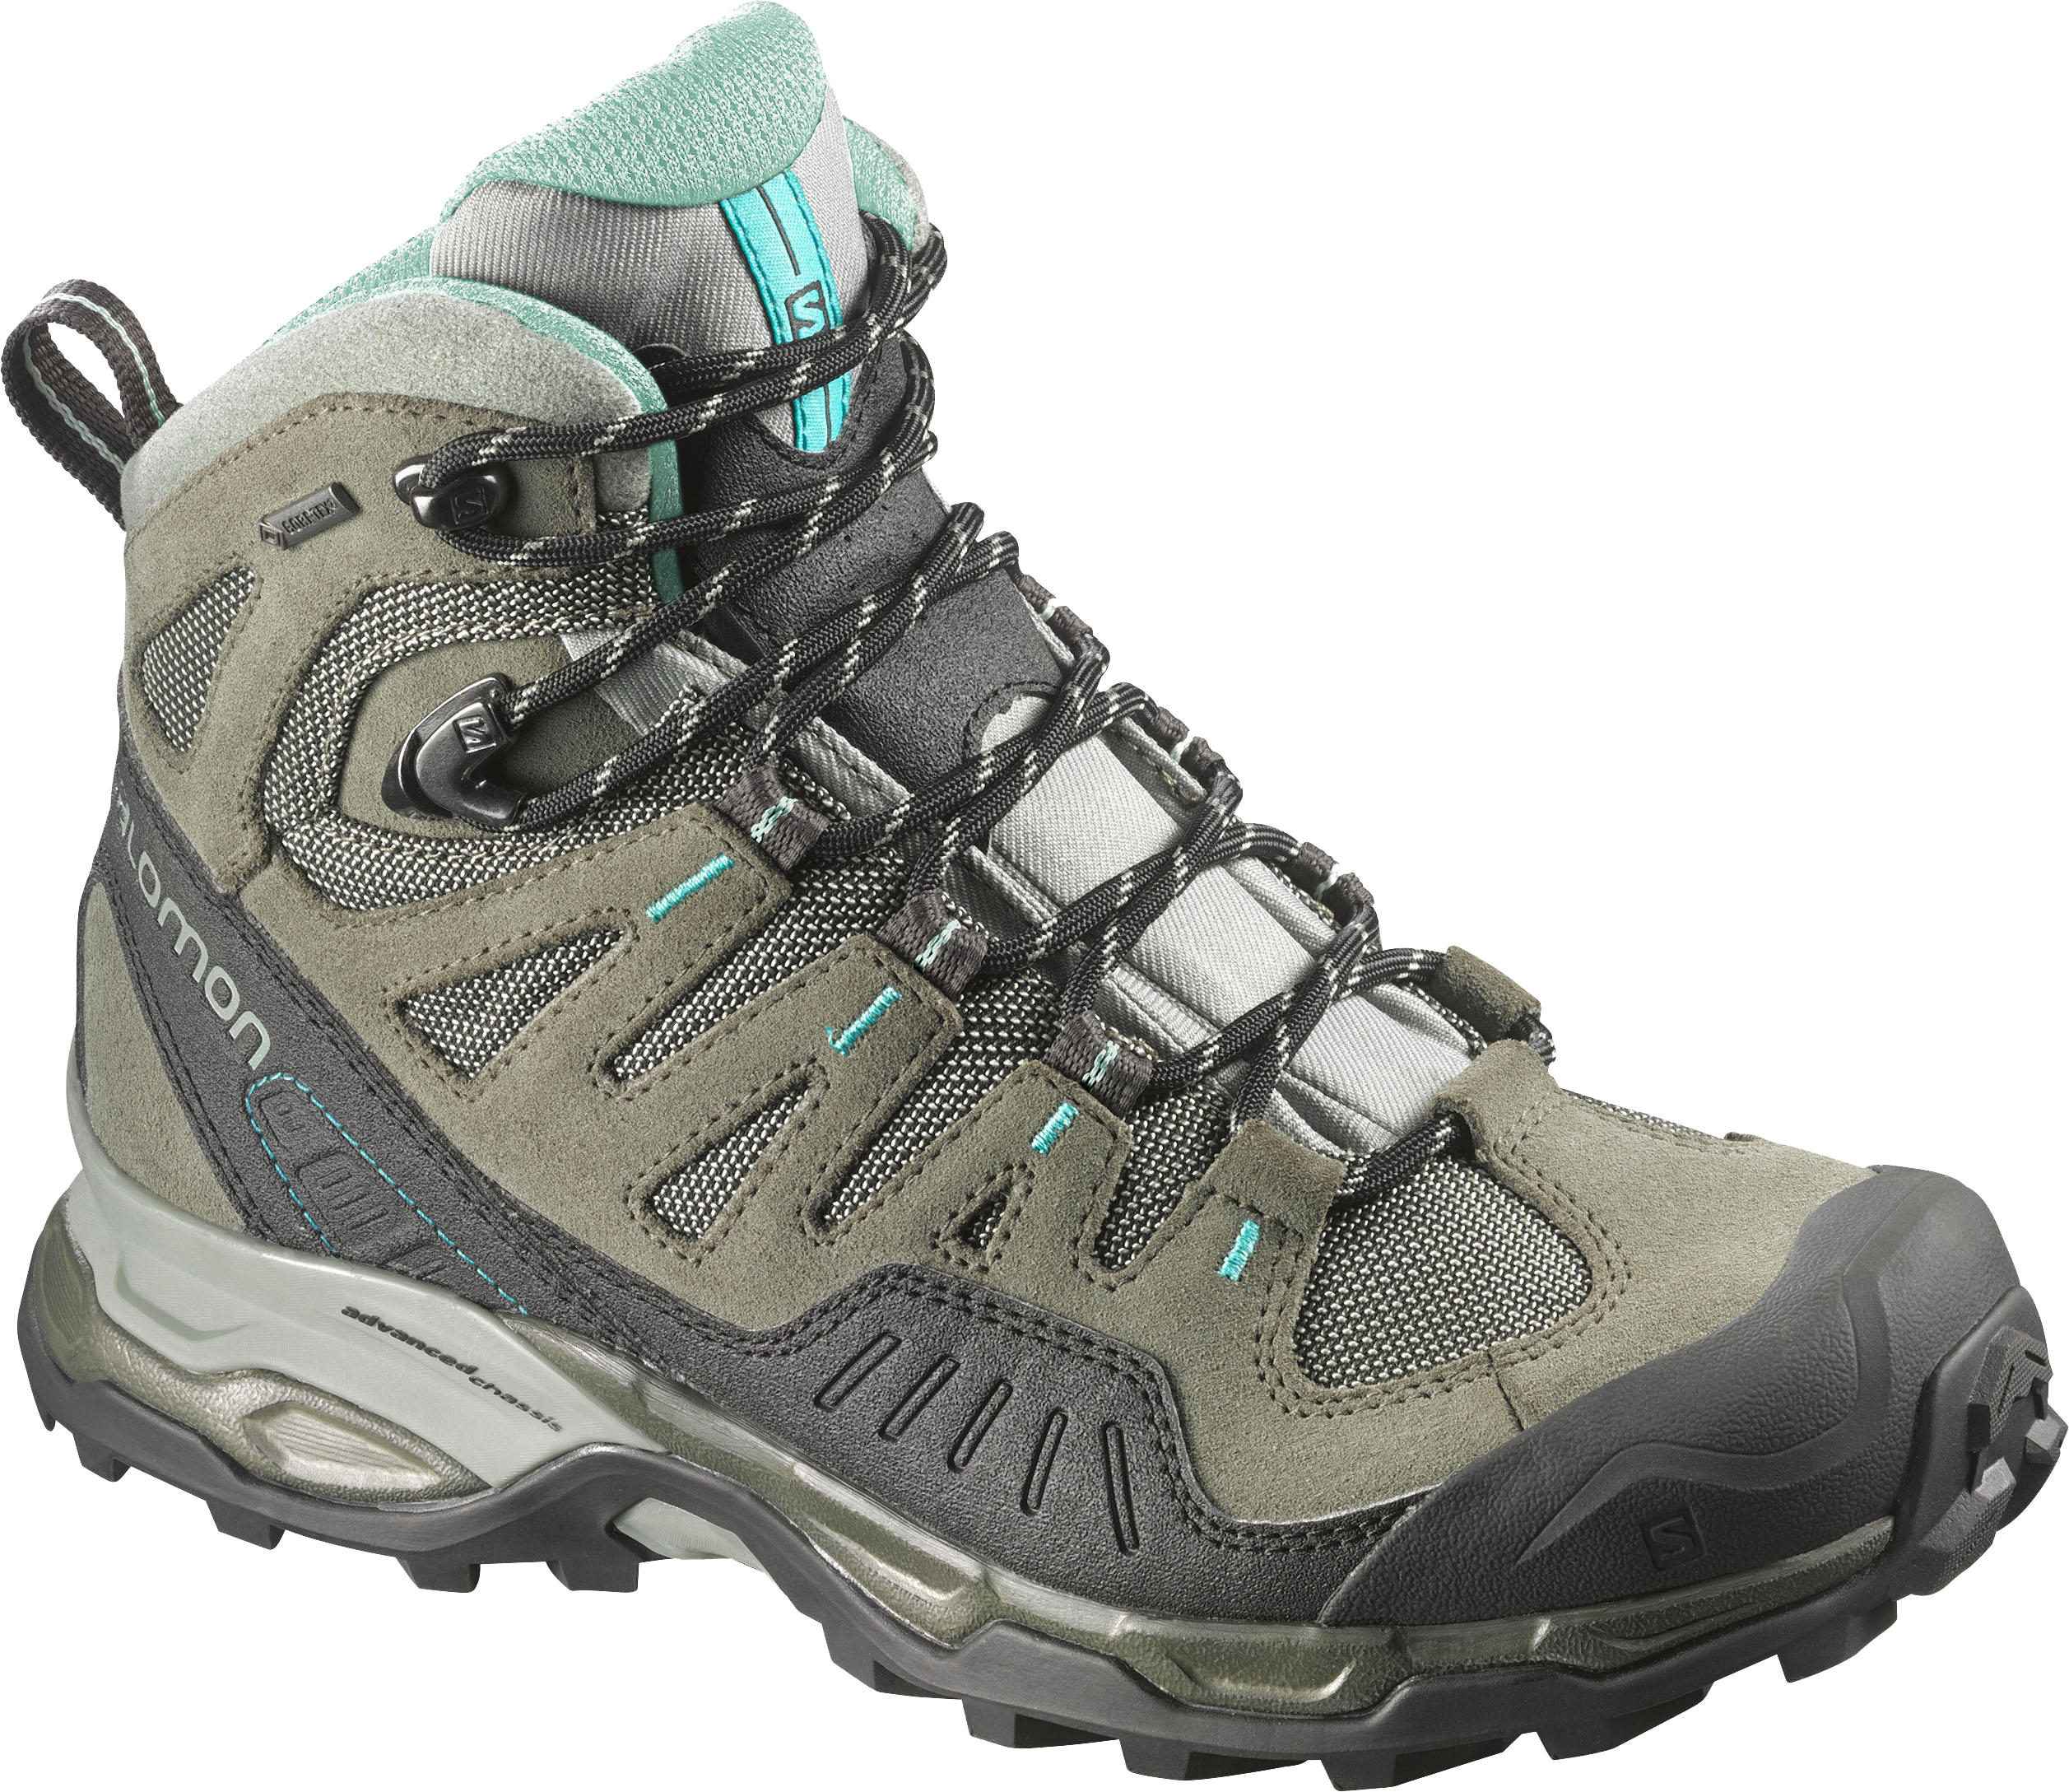 c9152976fc Salomon Conquest GTX Day Hiking Boots - Women's